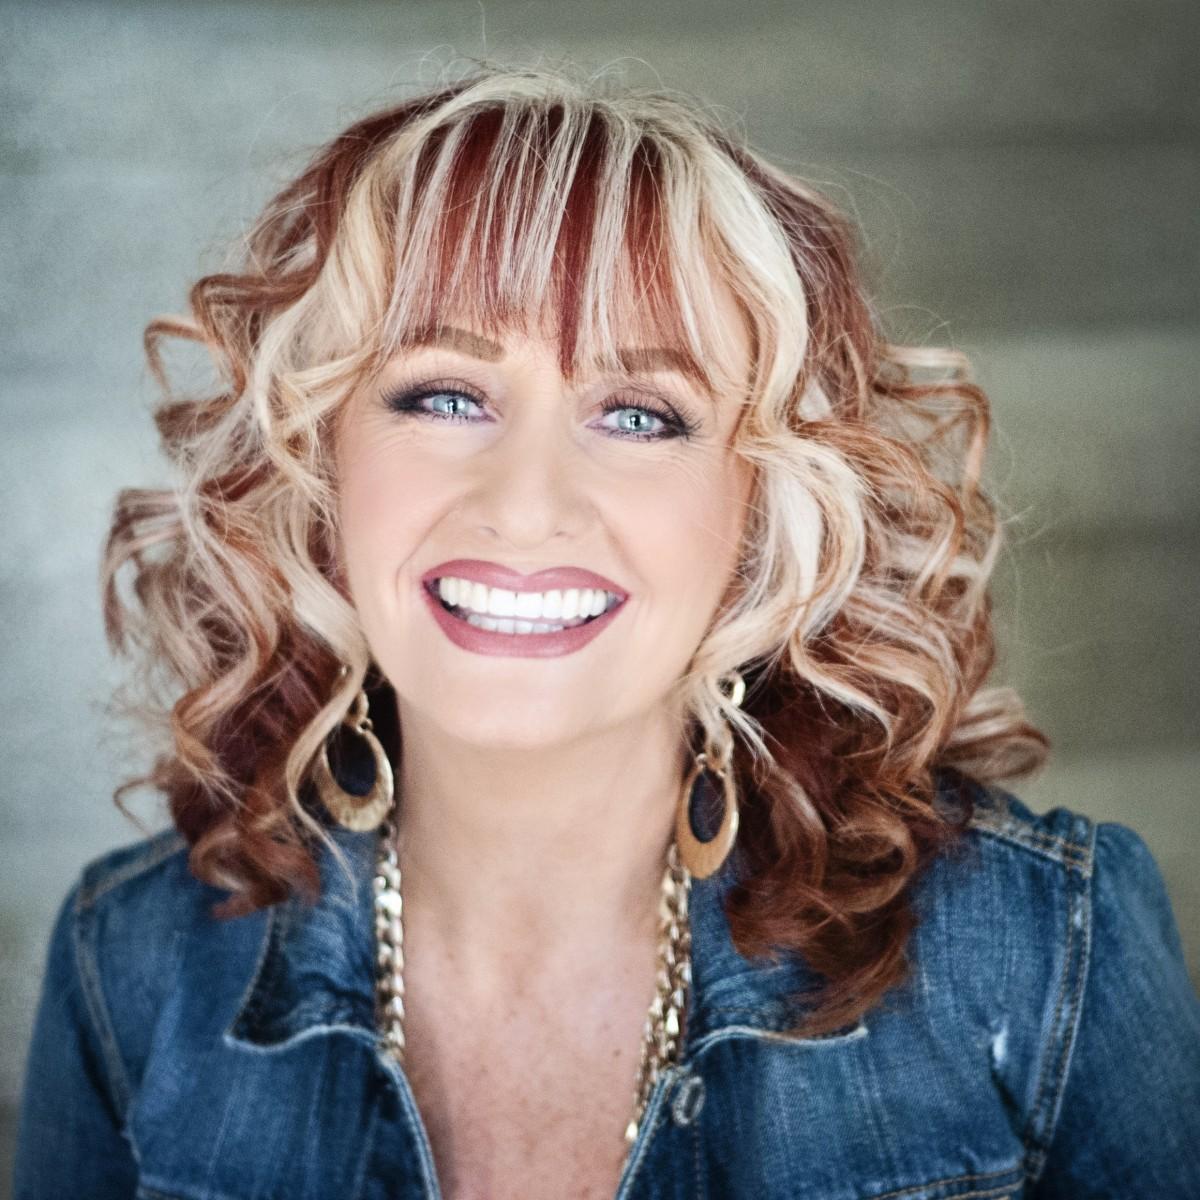 Melissa Montana